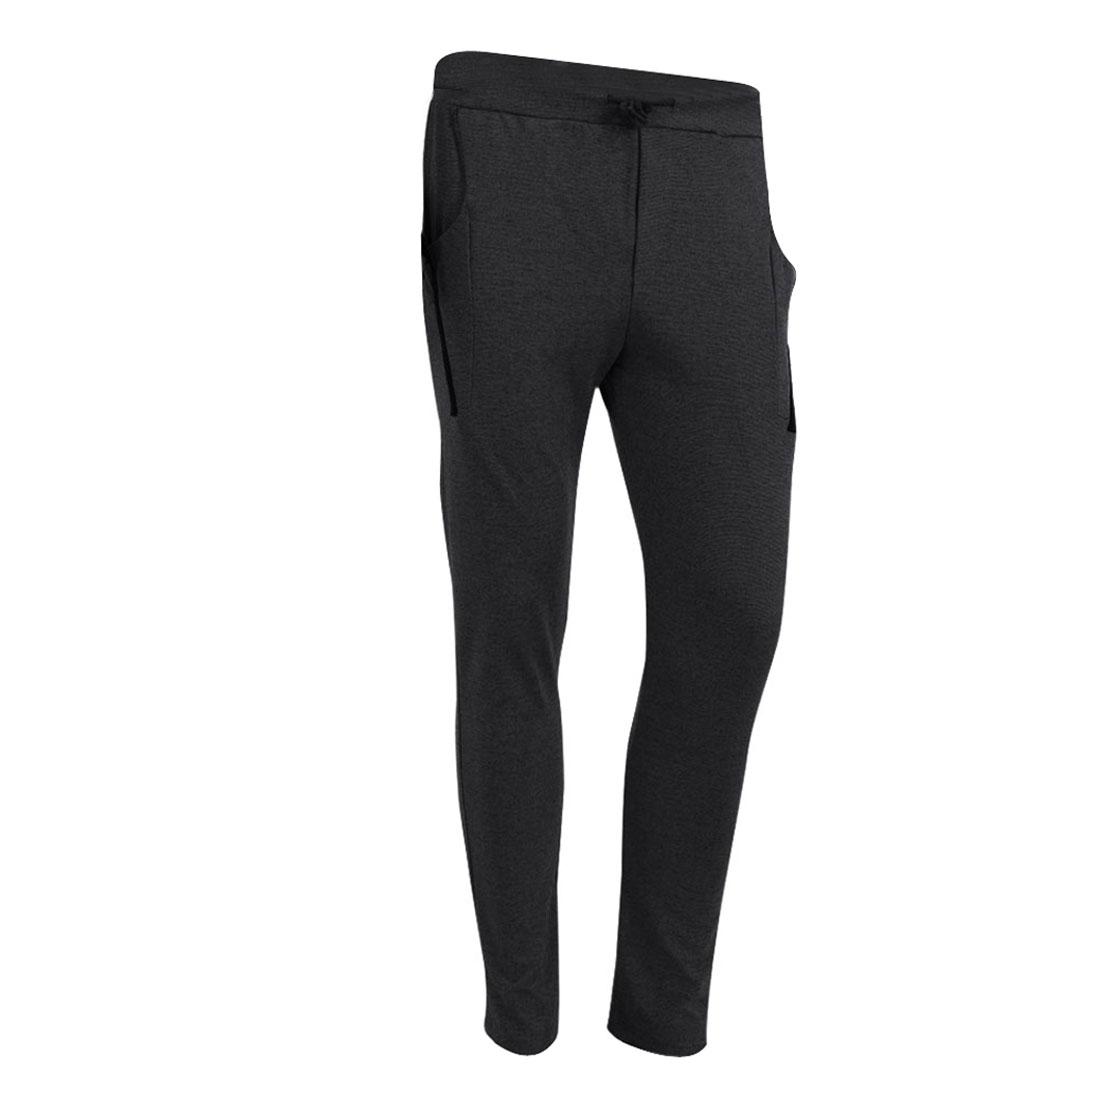 Man Stylish Buttons Slant Pockets Stretchy Leisure Harem Pants Dark Gray W28